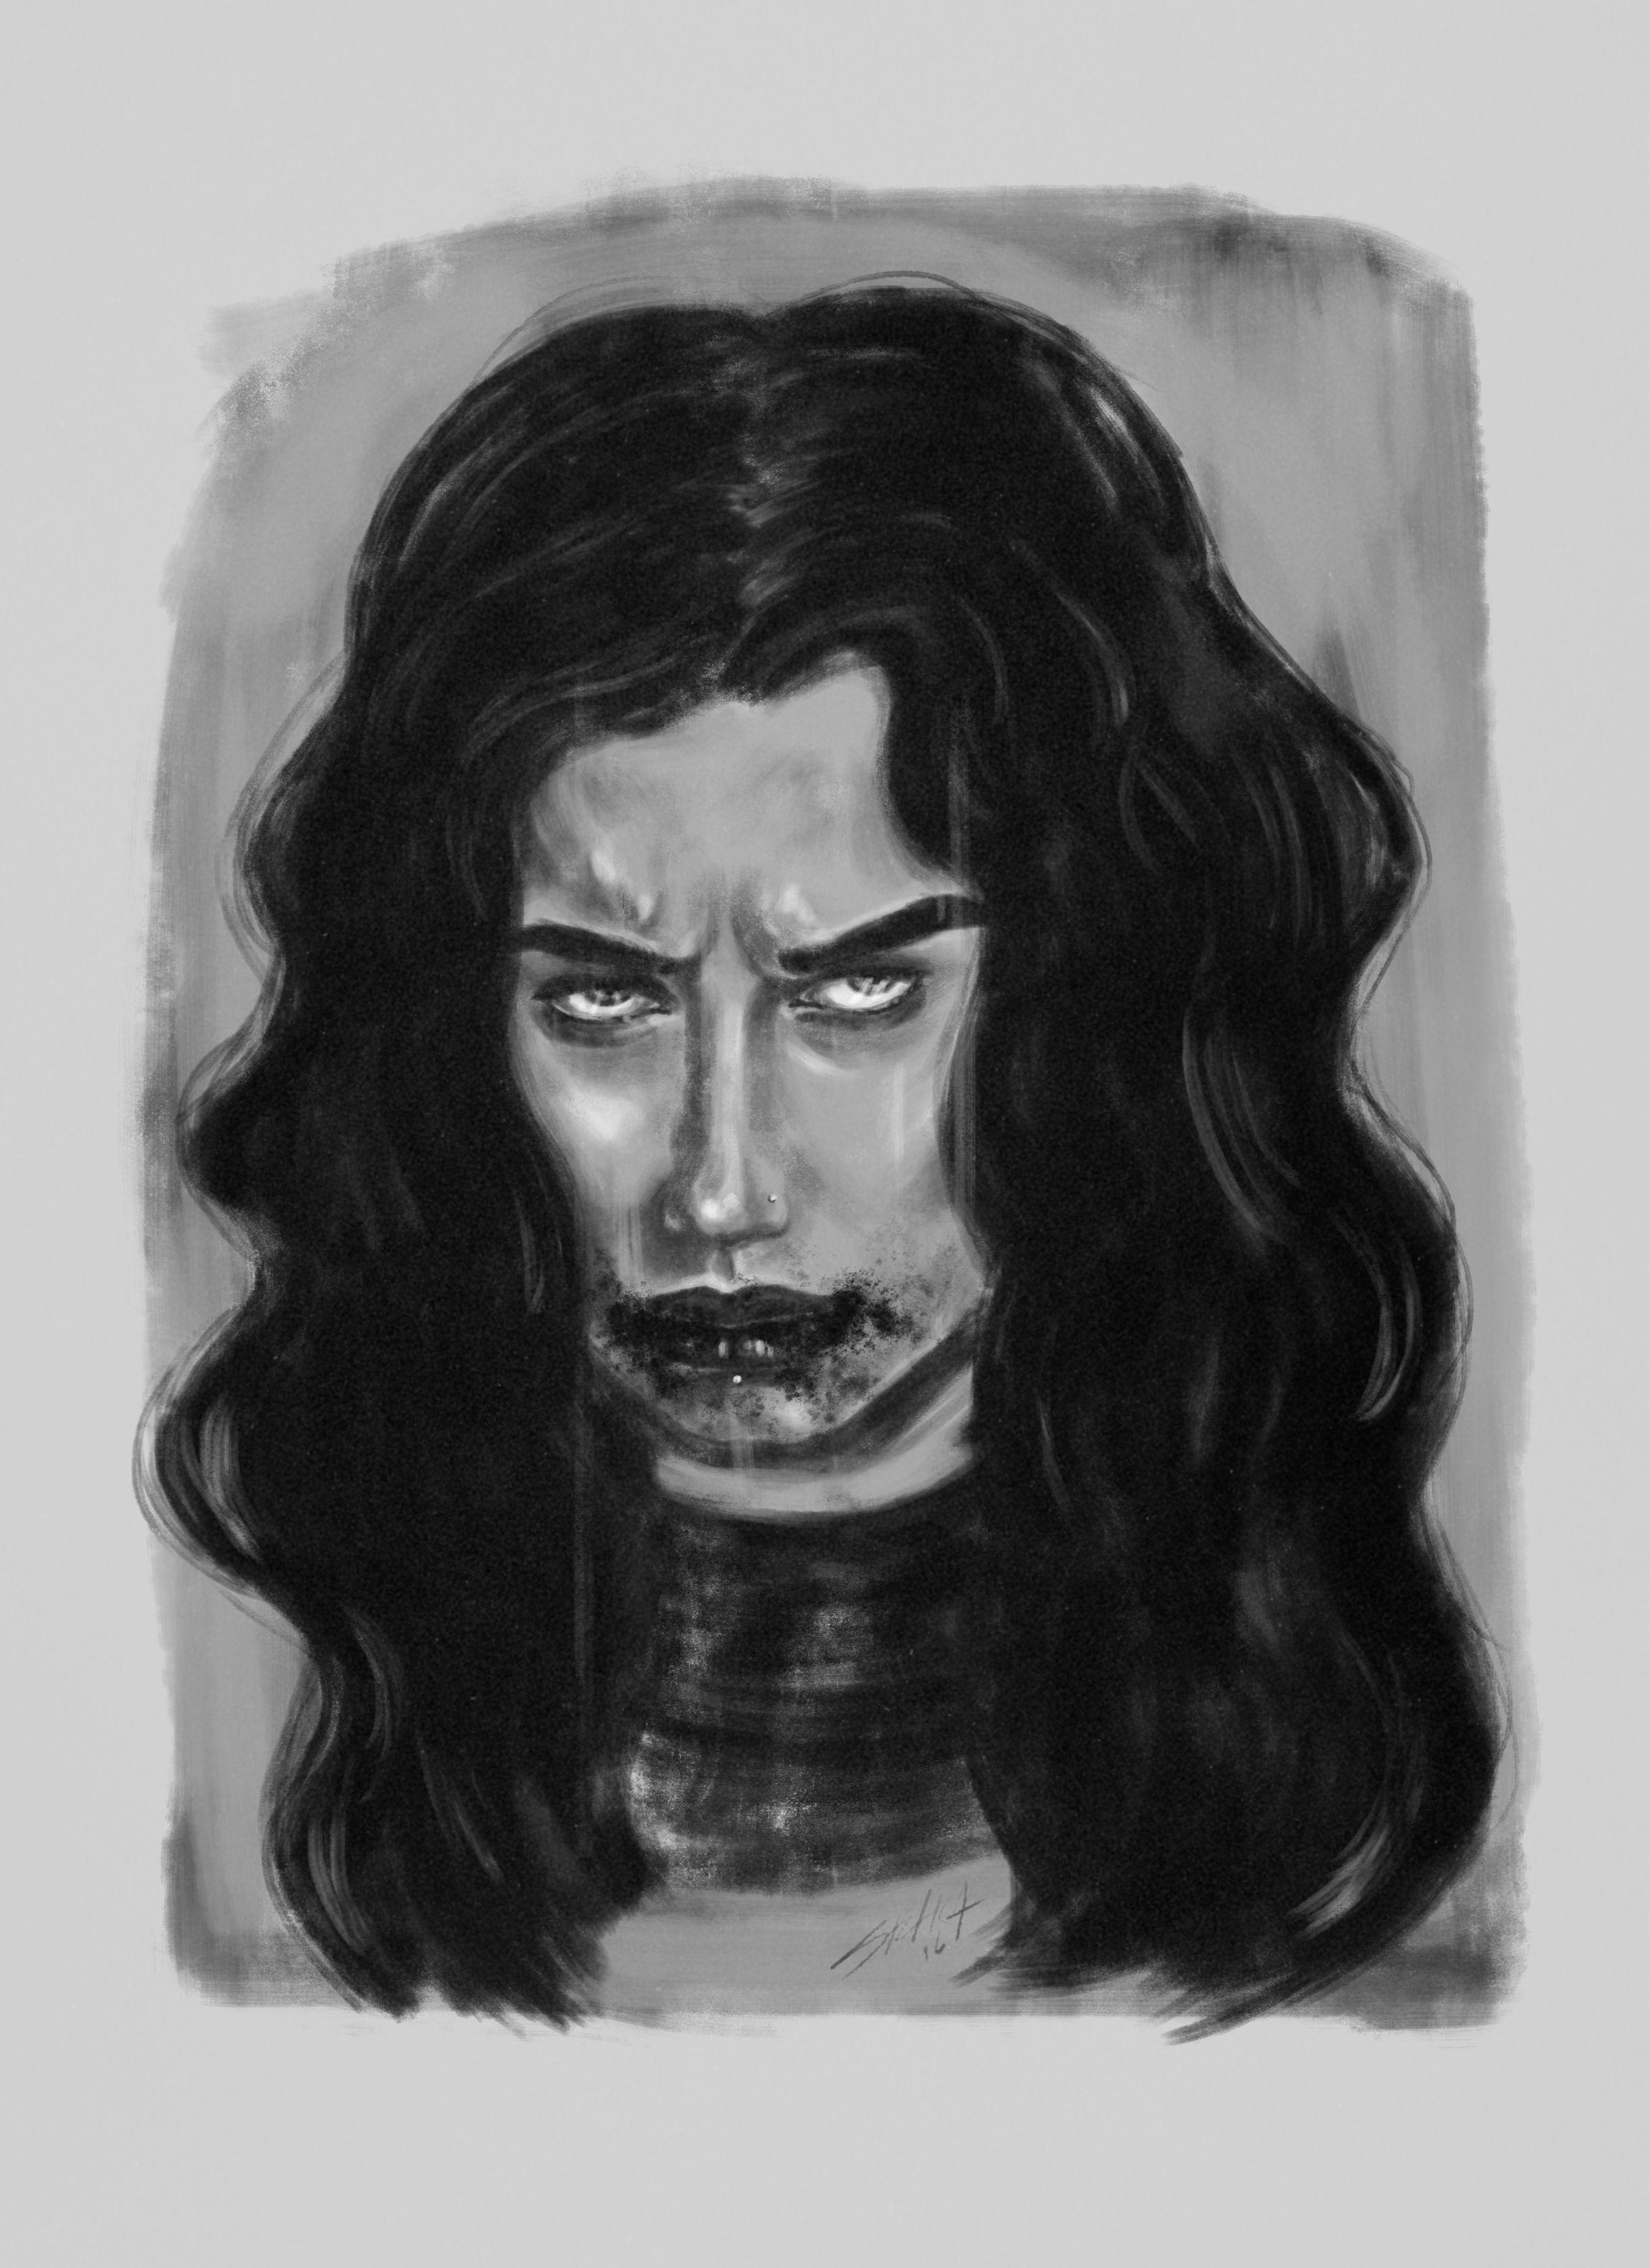 Just a Bite  #art #arte #bite #vampire #blackandwhite #woman #women #portrait #blood #painting #pintura